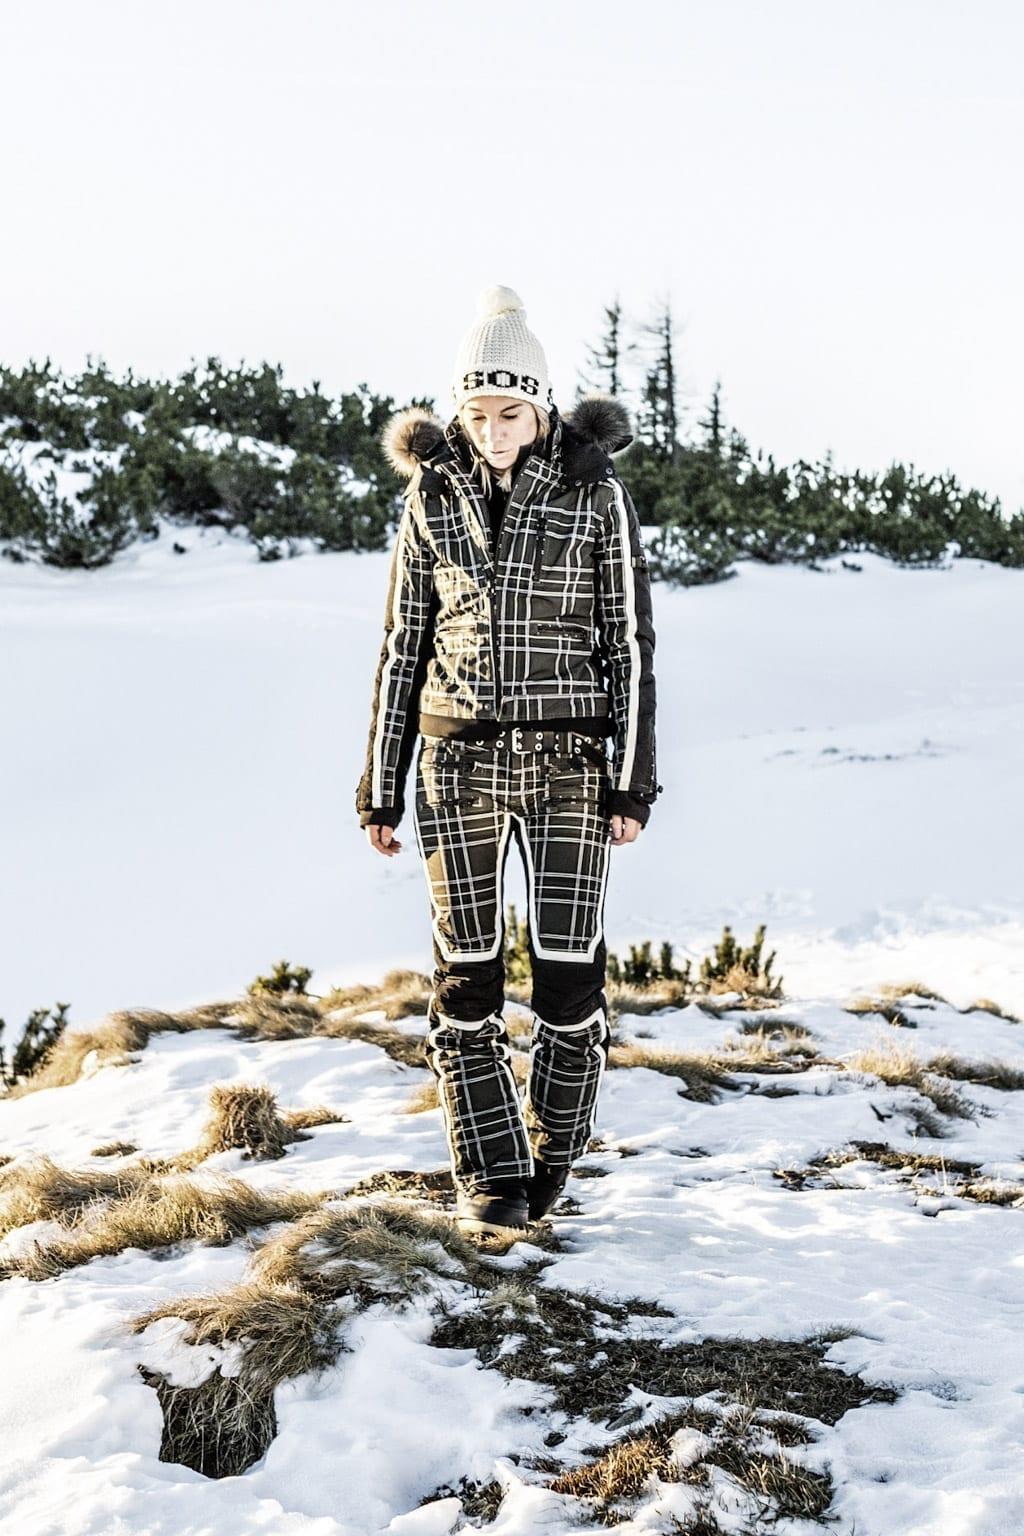 ck-constantlyk-com-sos-skiwear-sportswear-austria-alps-wagrain-4997-2